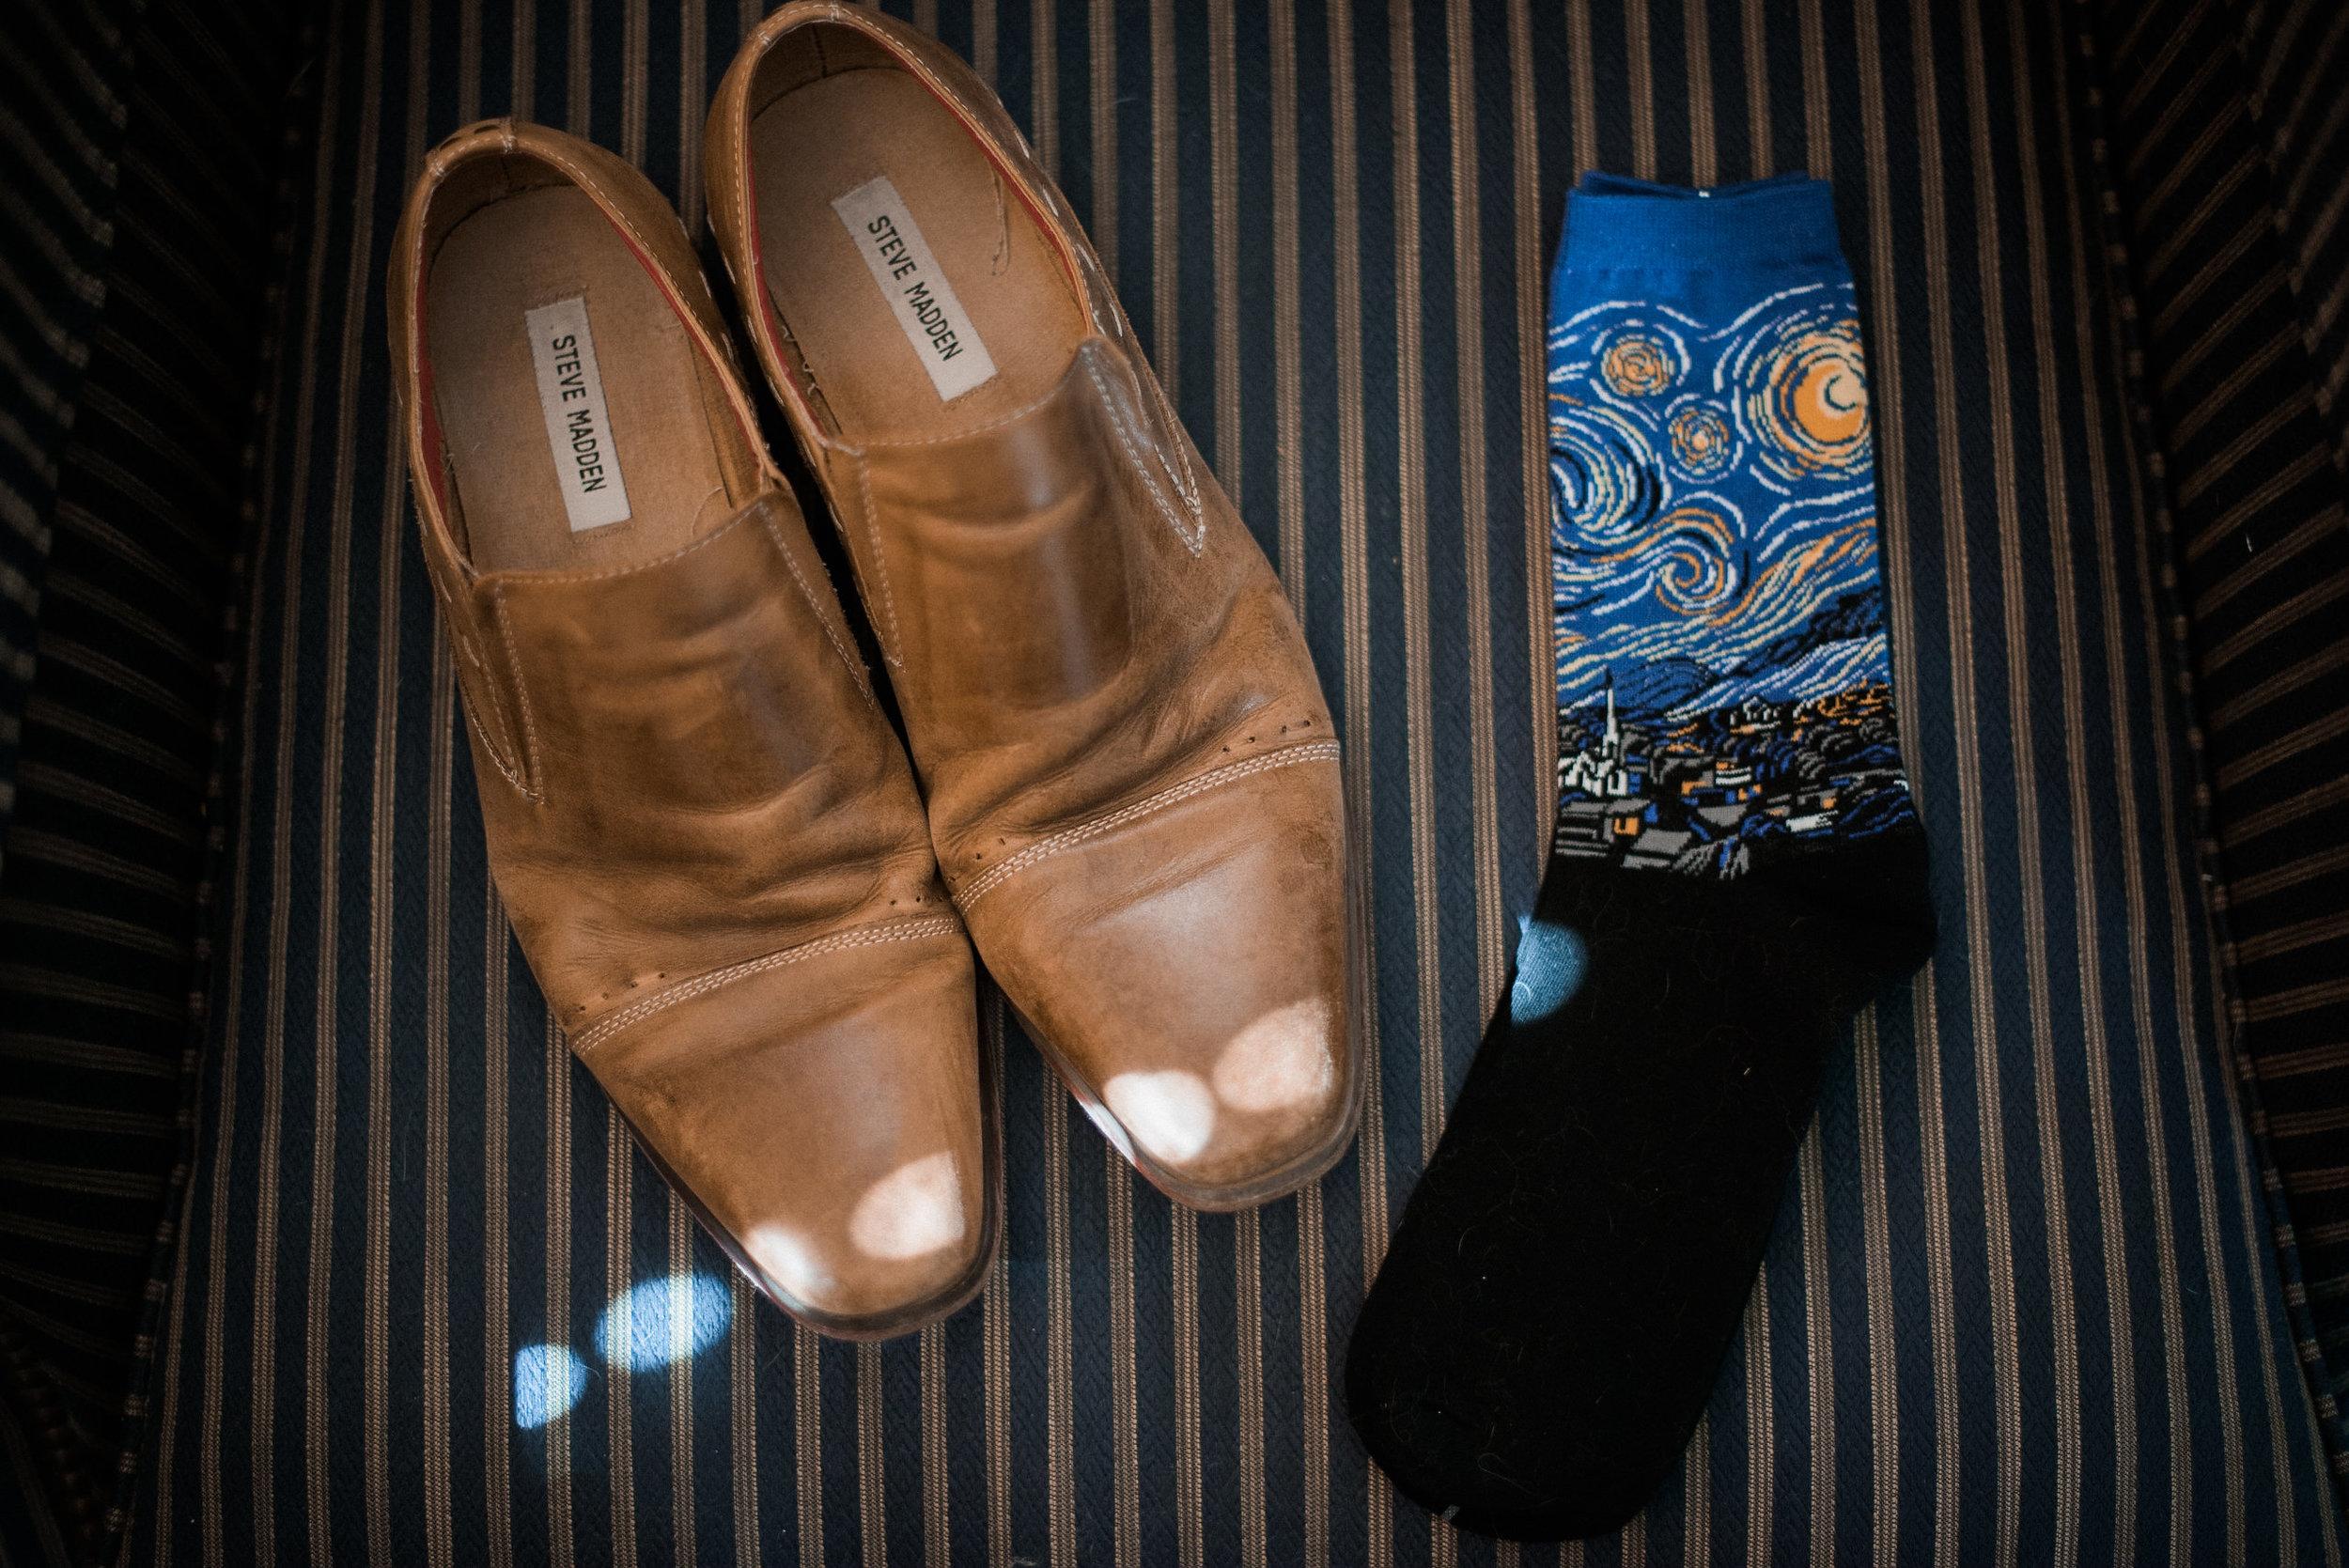 Groom shoes and socks